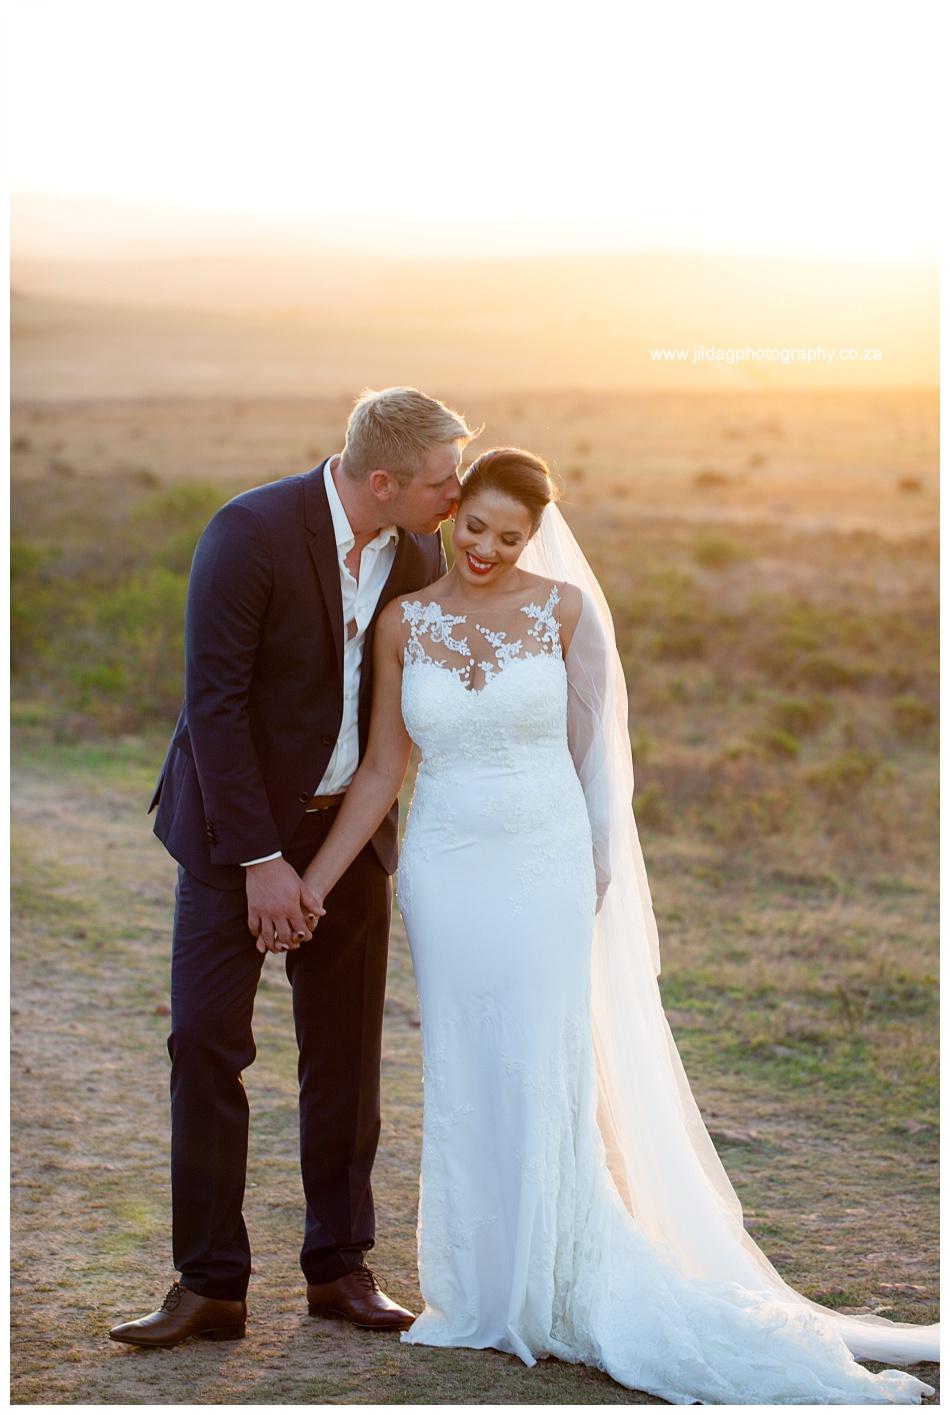 Jilda-G-Photography-safari-wedding-Garden_Route_Game_lodge_1881